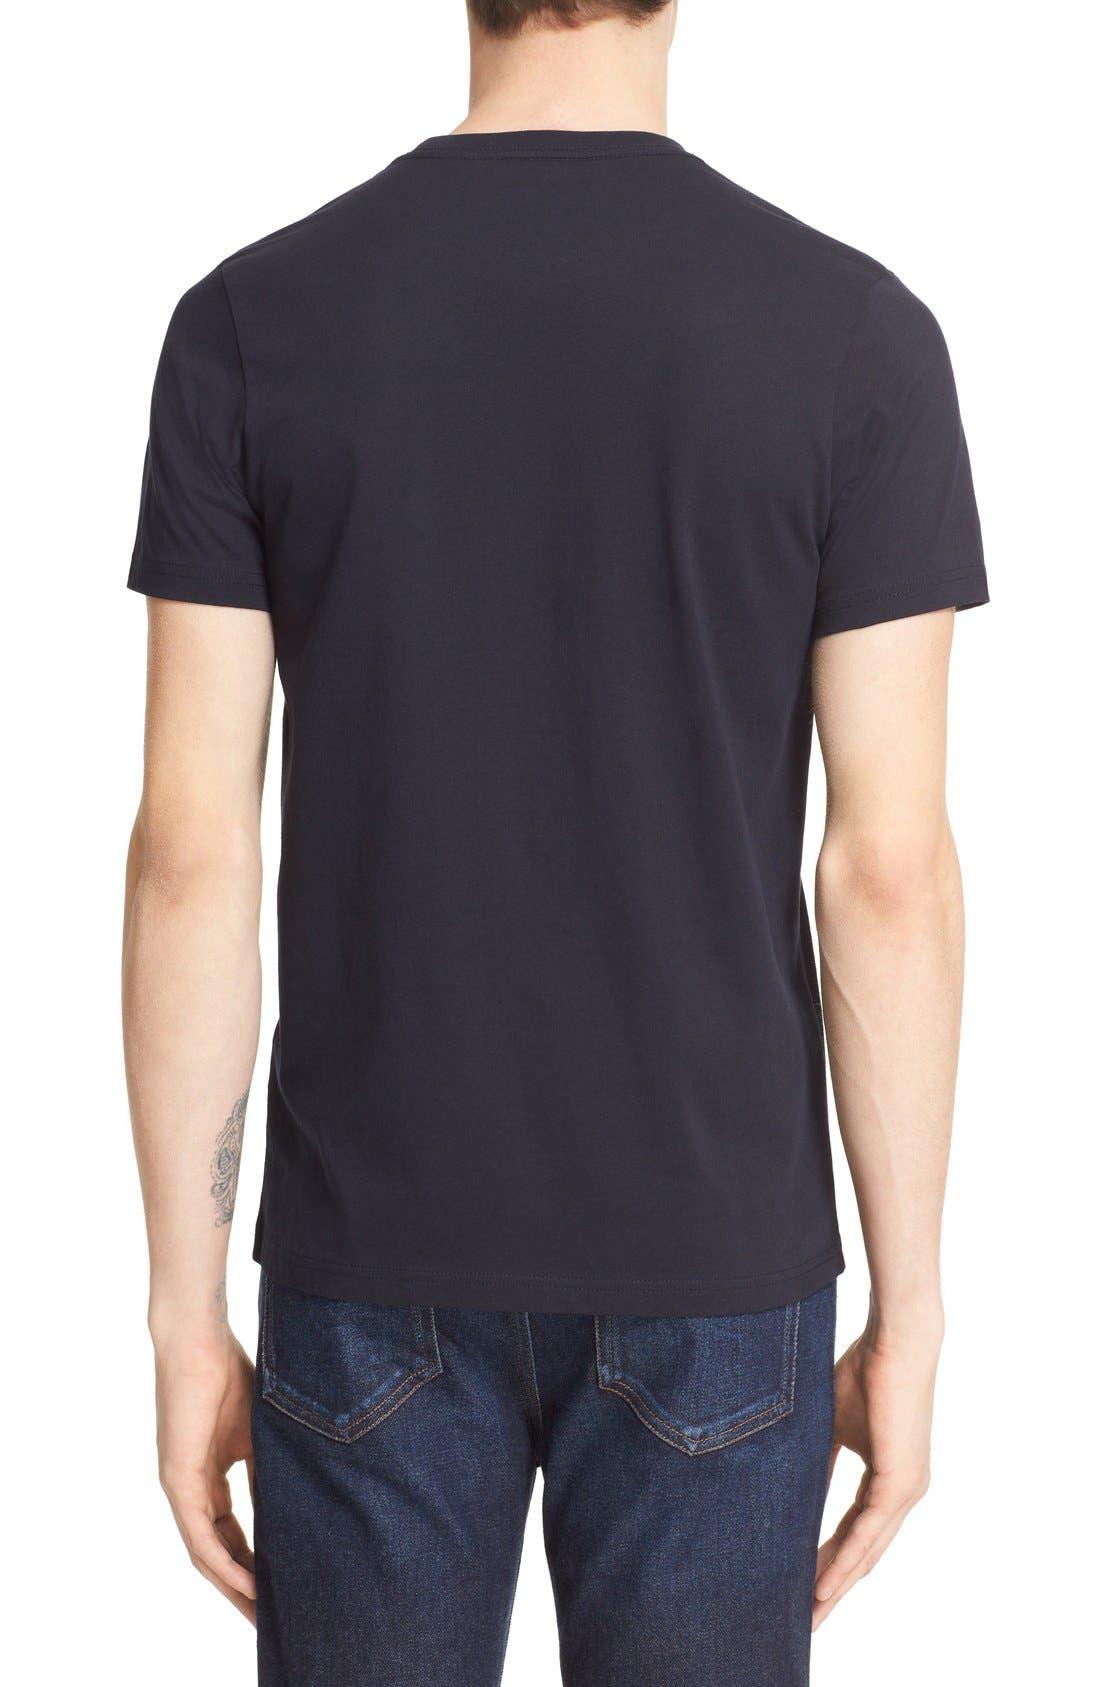 Paul Smith 'P.S. I Love You' Graphic Cotton T-Shirt,                             Alternate thumbnail 2, color,                             414